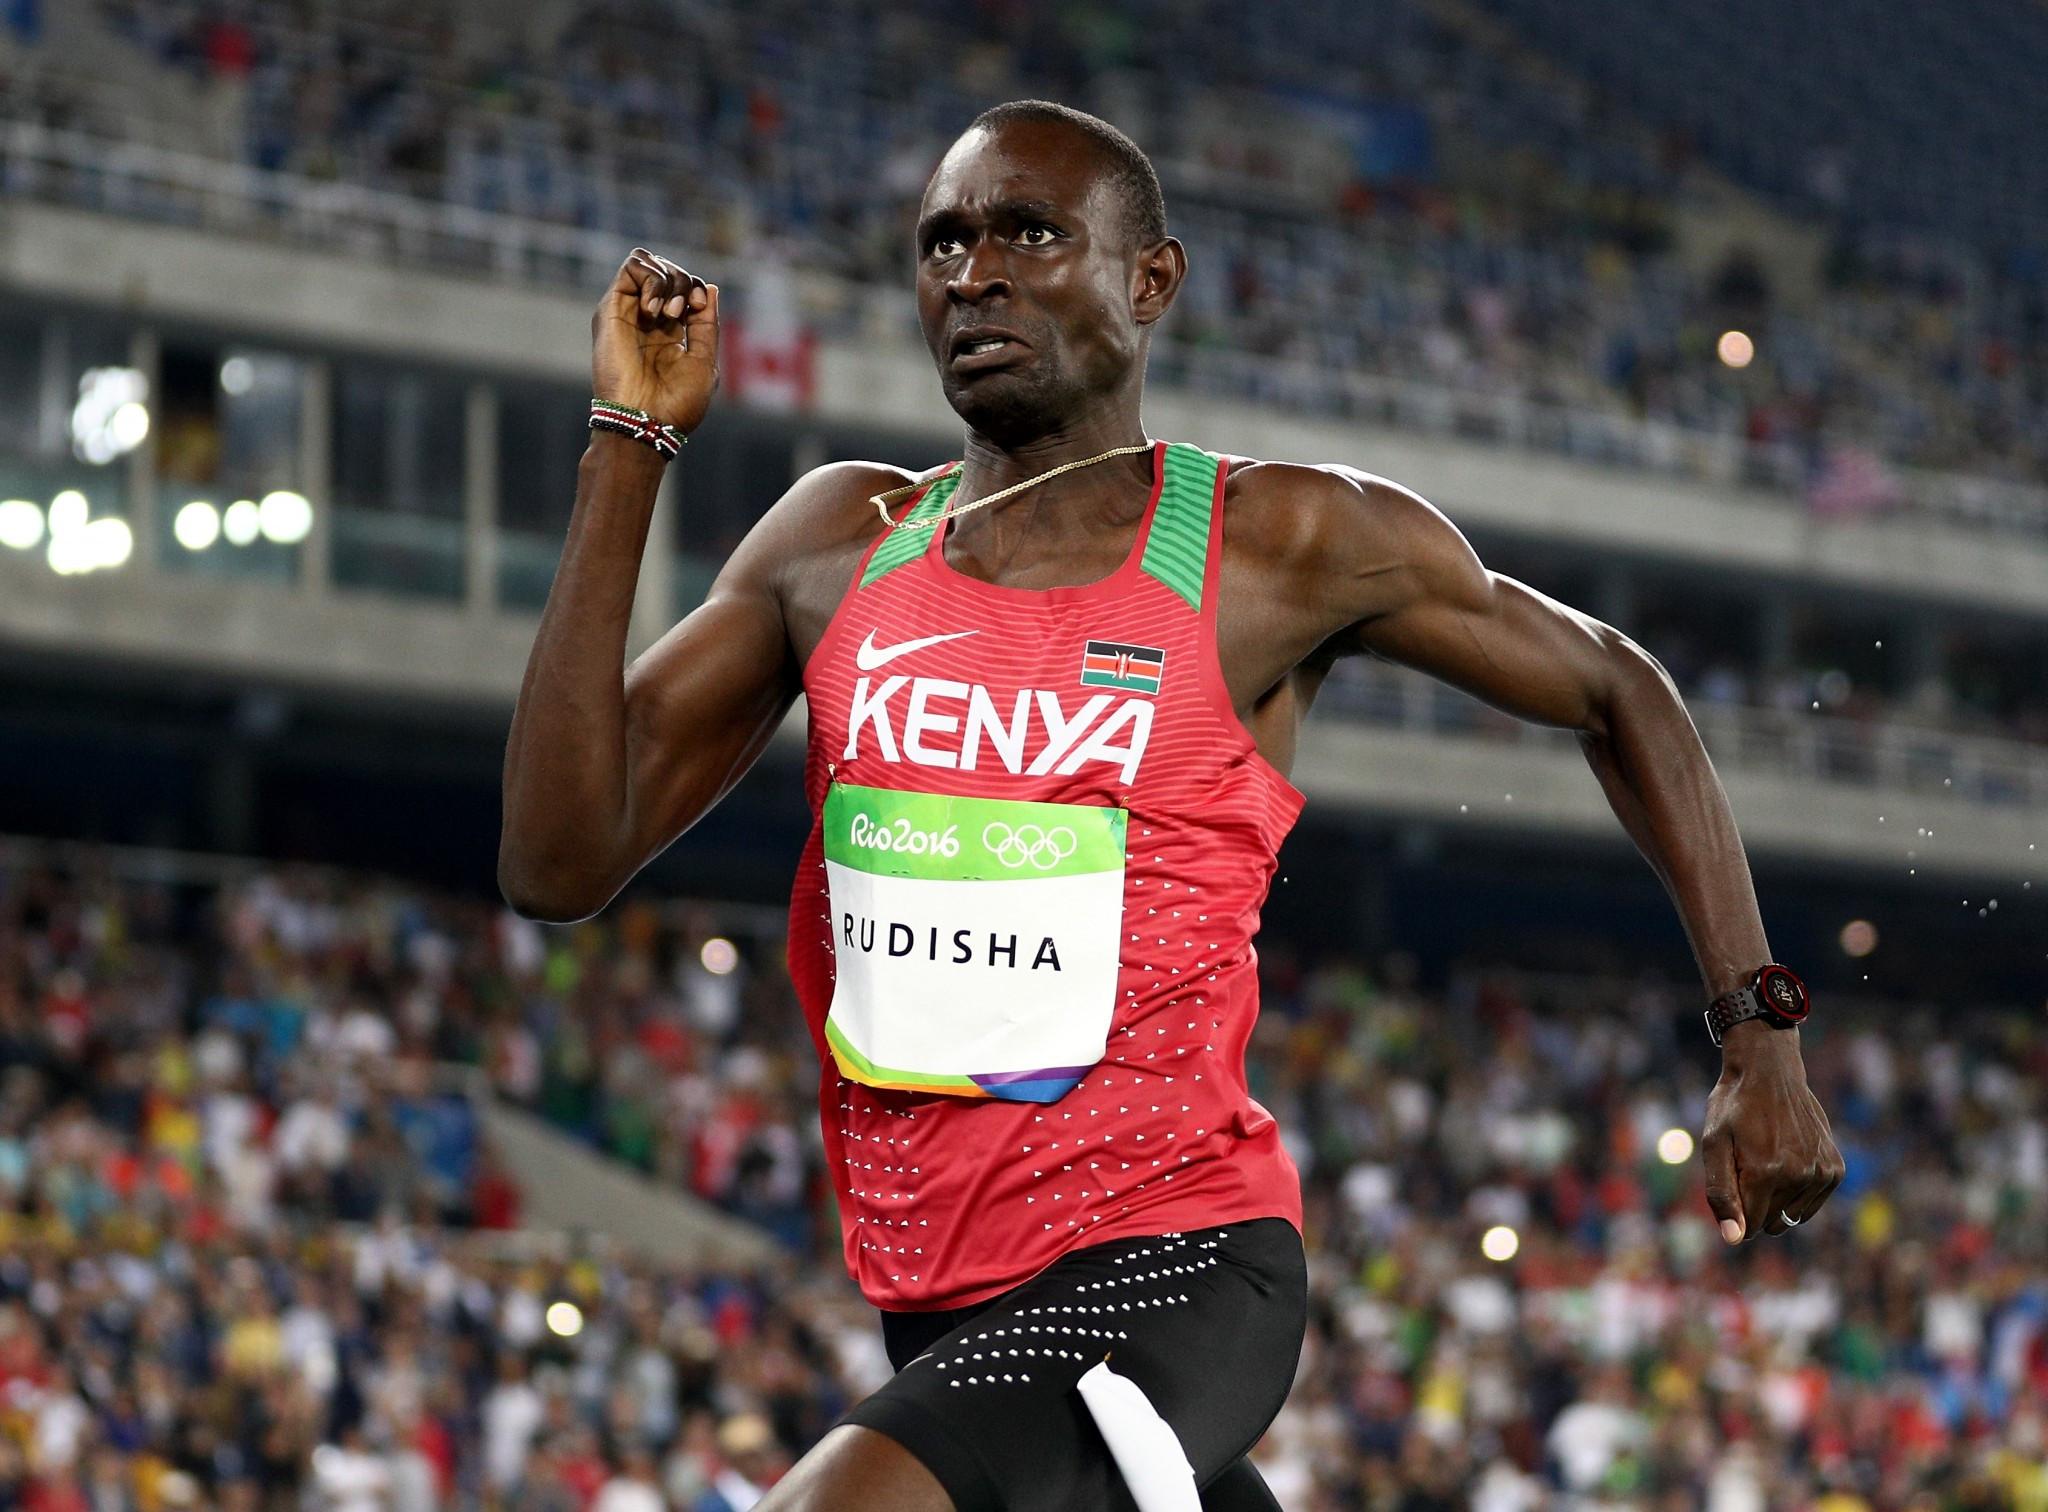 Rudisha joins Braz on the IAAF World Championships sidelines